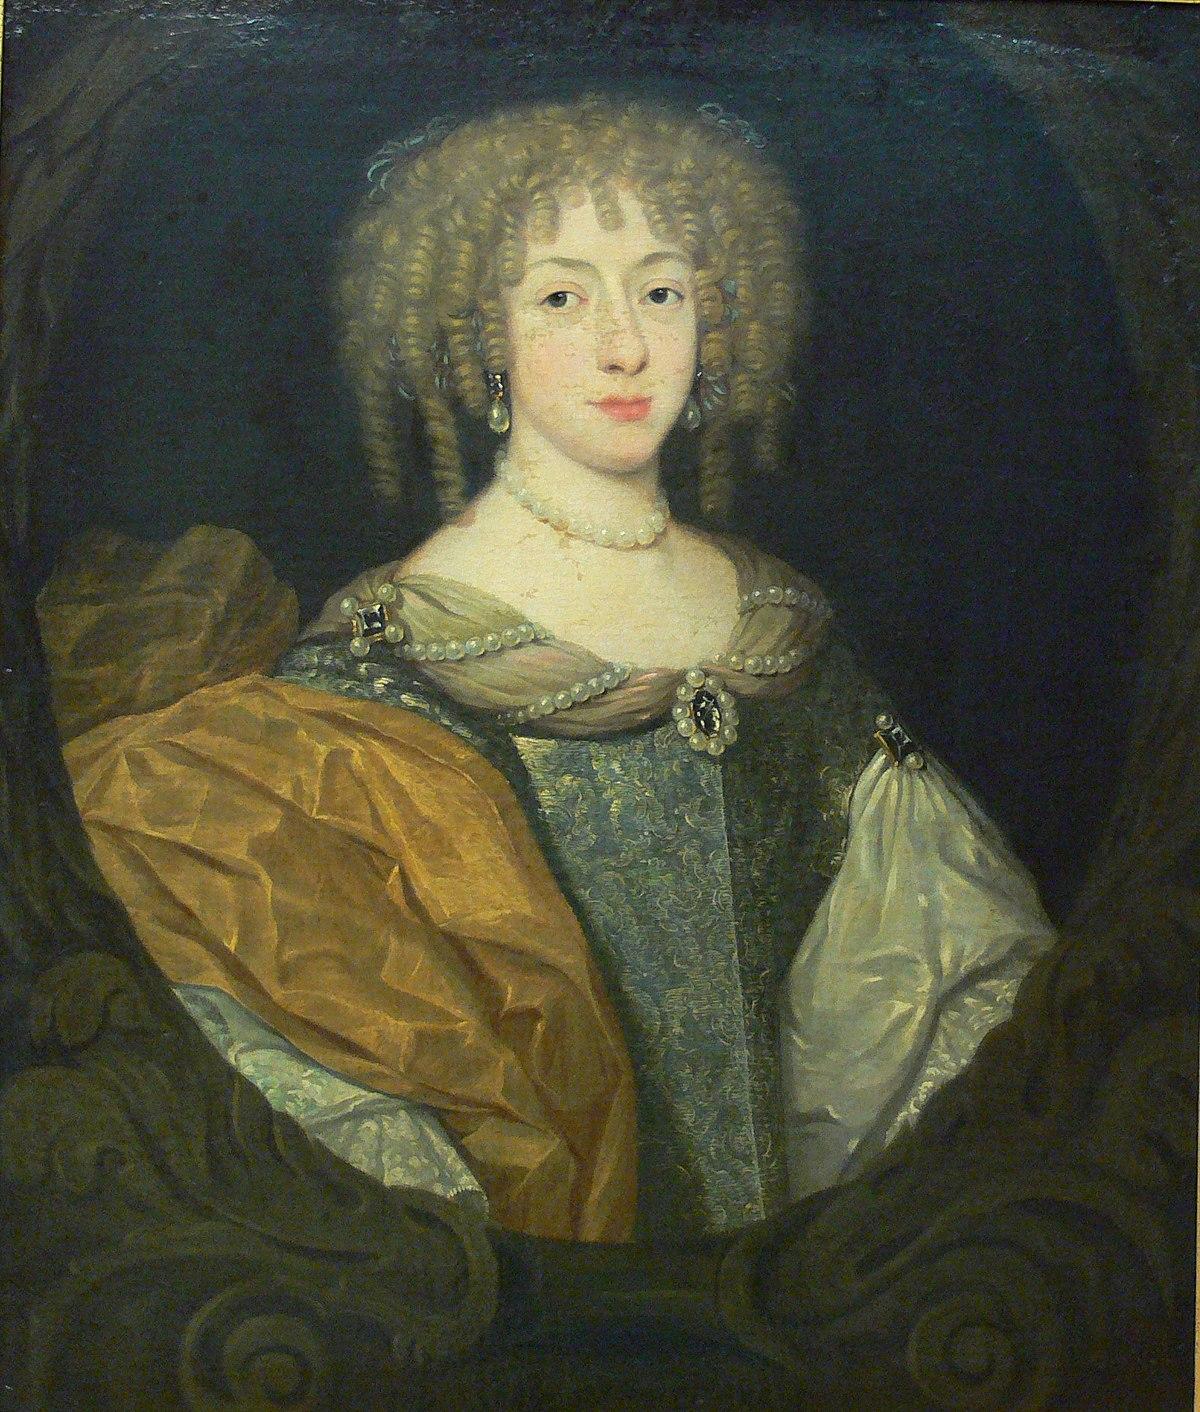 Briefe Liselotte Von Der Pfalz : Elisabeth charlotte of the palatinate wikimedia commons